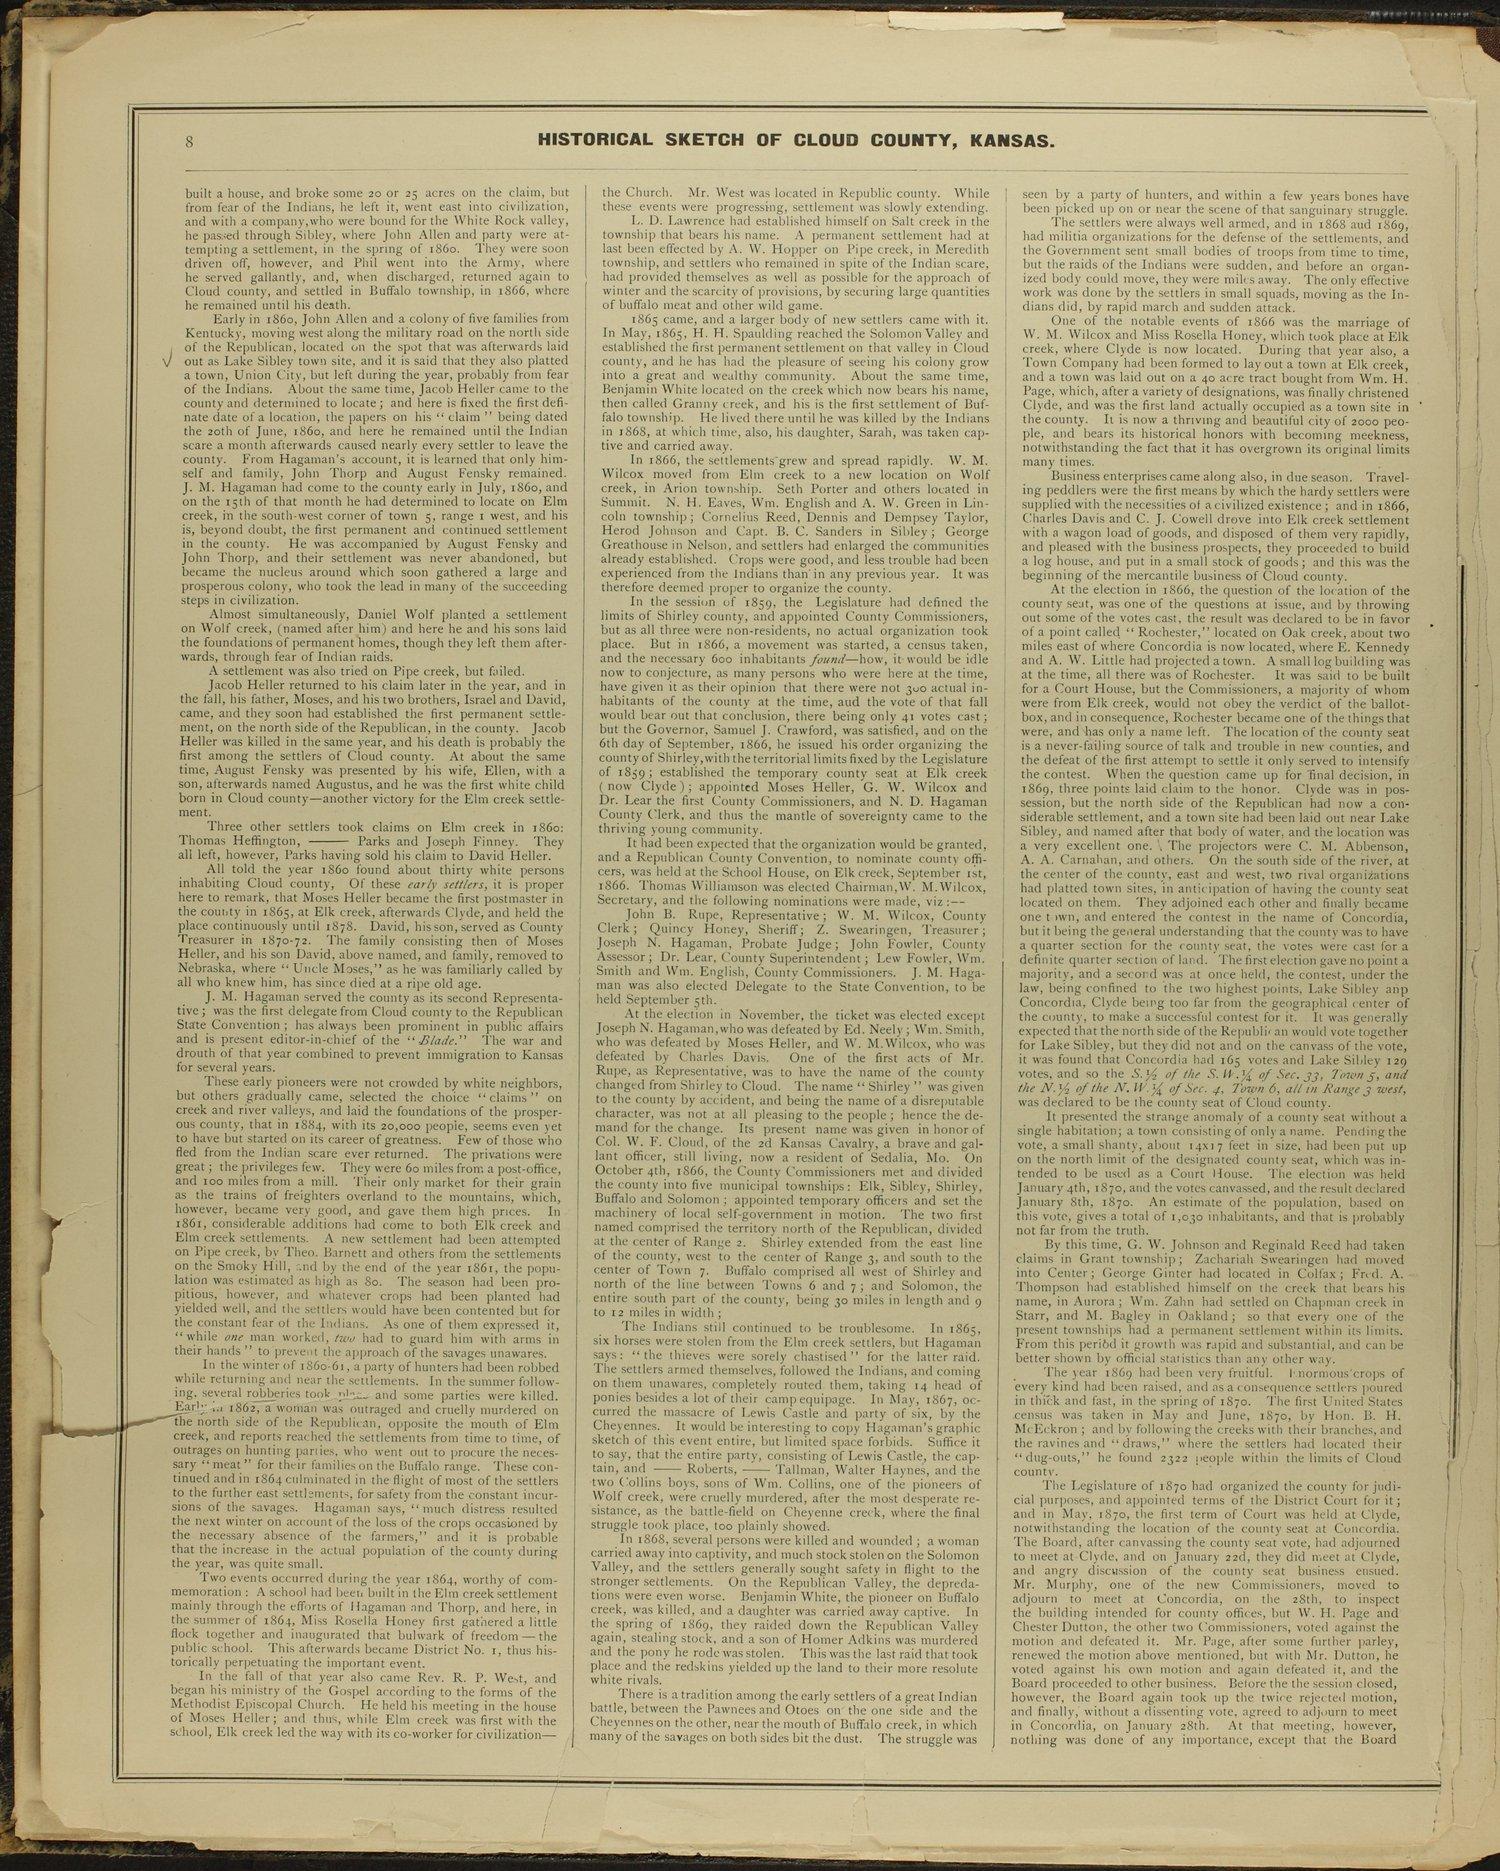 Edward's atlas of Cloud County, Kansas - 8